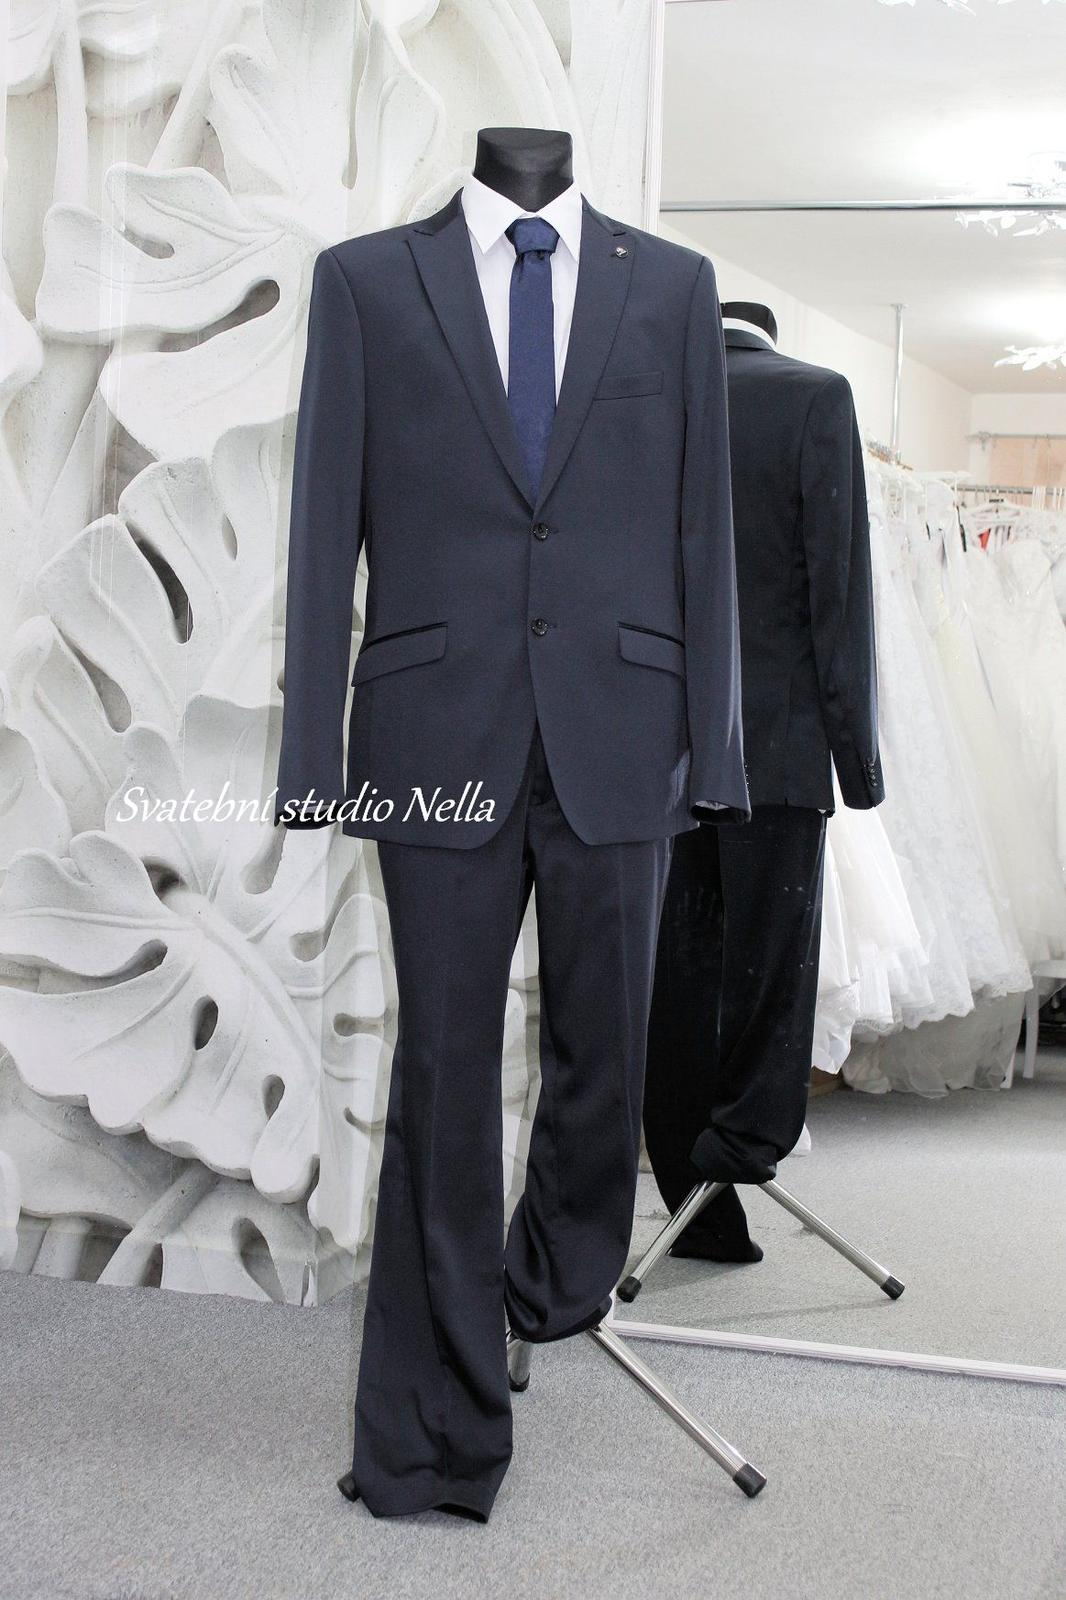 Pánský oblek modrý temný BB slim vel.54 - Obrázek č. 1